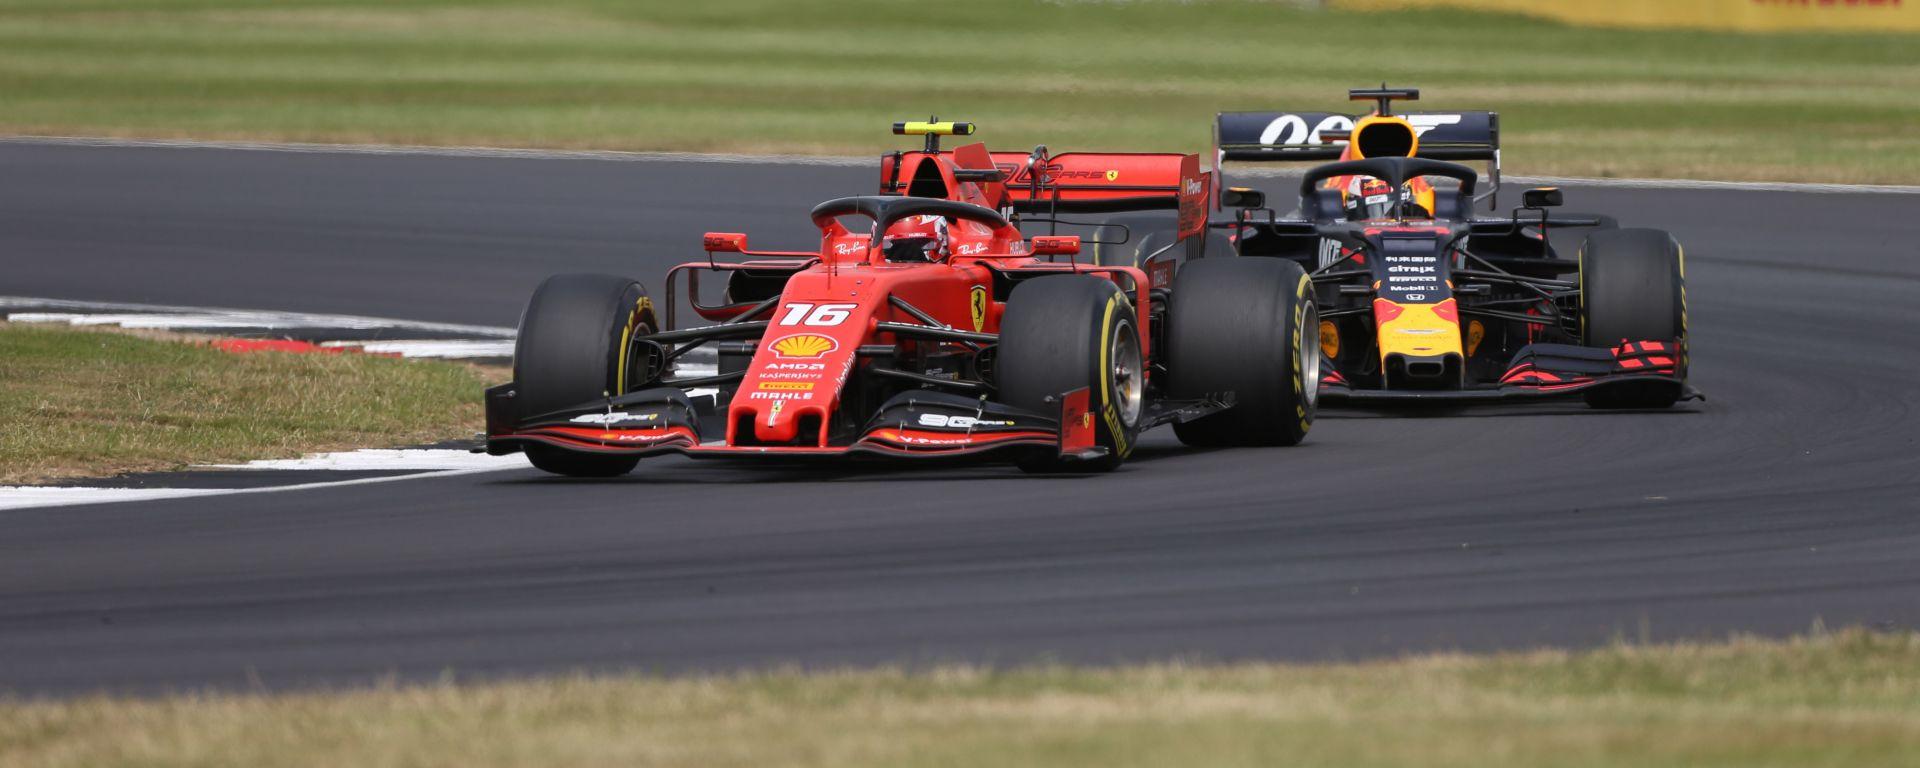 GP Gran Bretagna 2019, Charles Leclerc (Ferrari) e Max Verstappen (Red Bull)